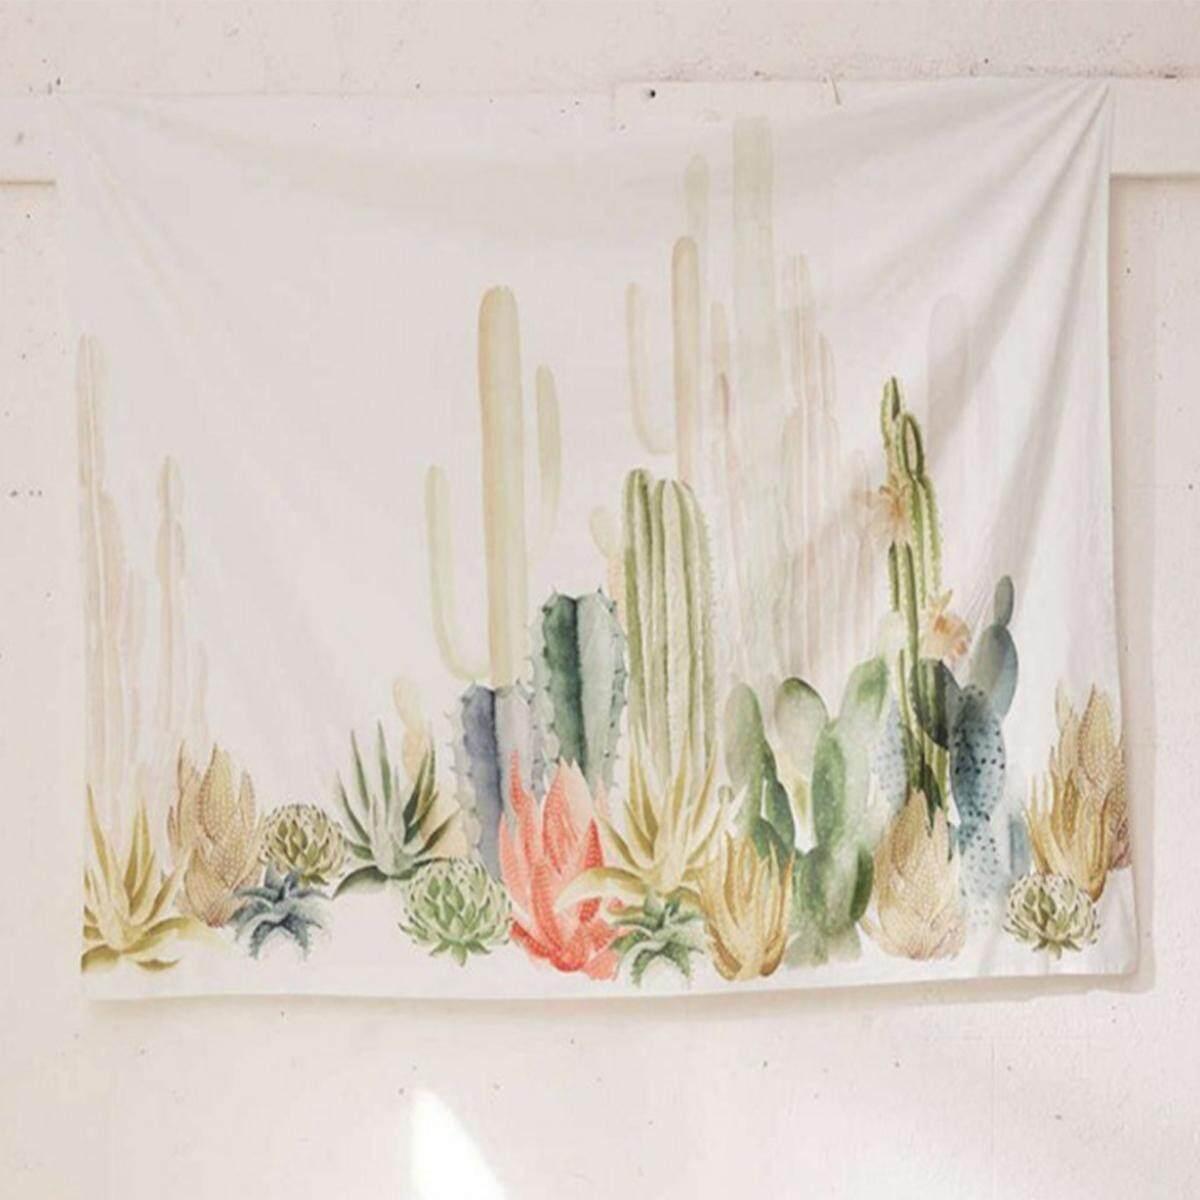 150*150cm Cactus Desert Plant Tapestry Wall Hanging Living Room Dorm Home Decor 2#